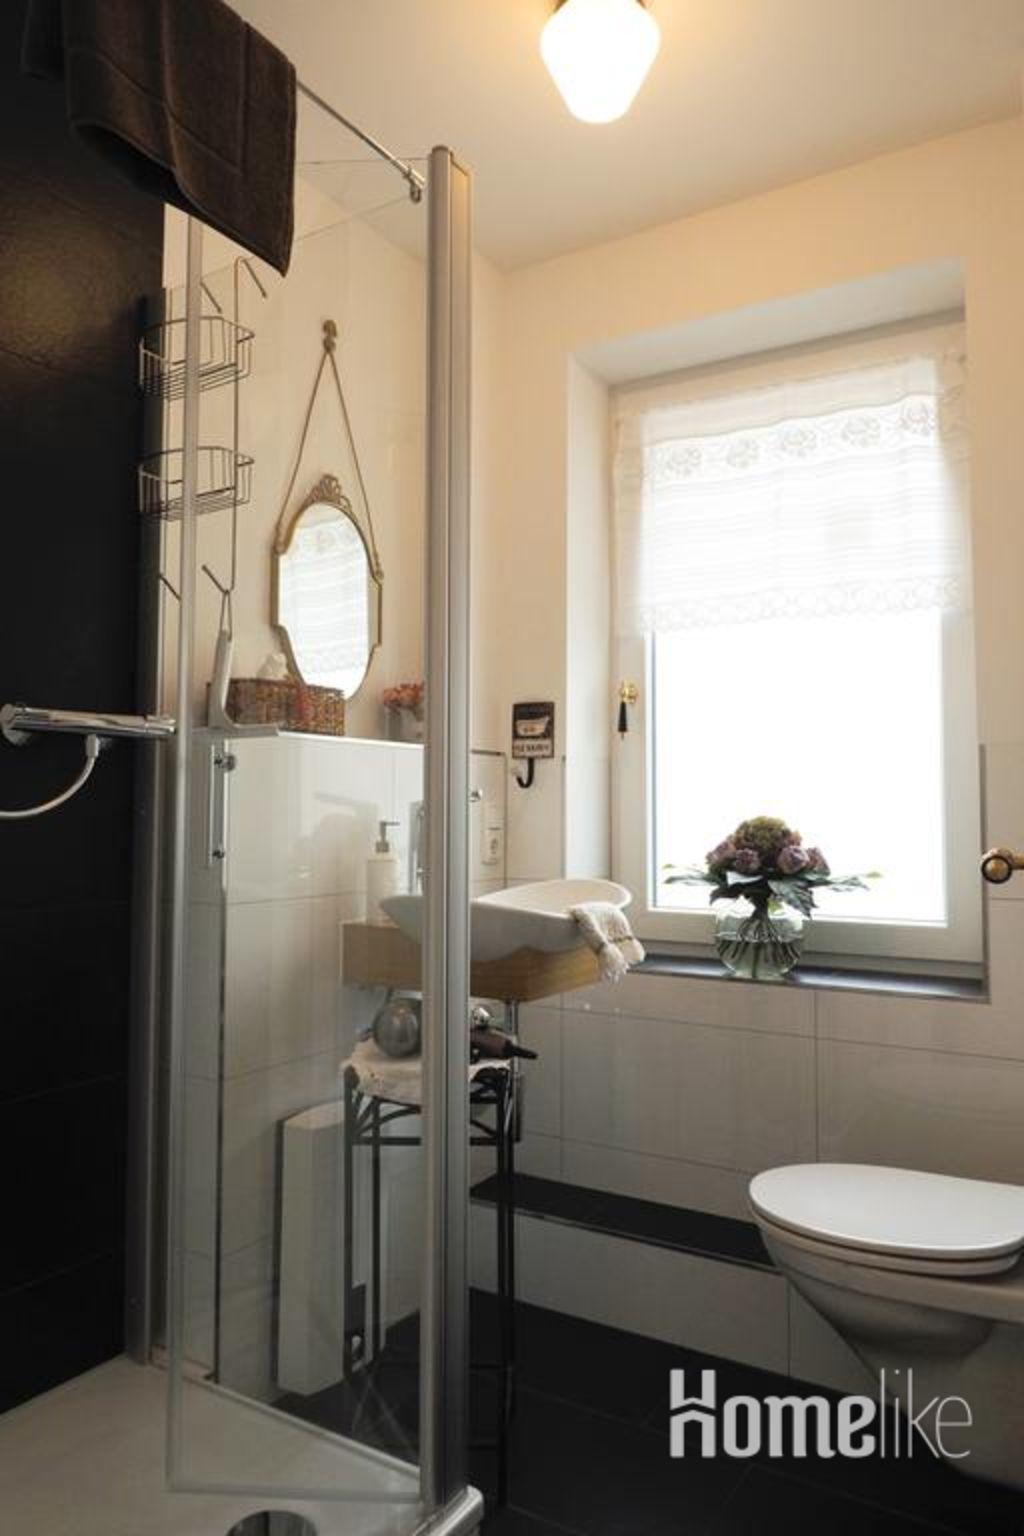 image 2 furnished 1 bedroom Apartment for rent in Bruhl, Rhein-Erft-Kreis